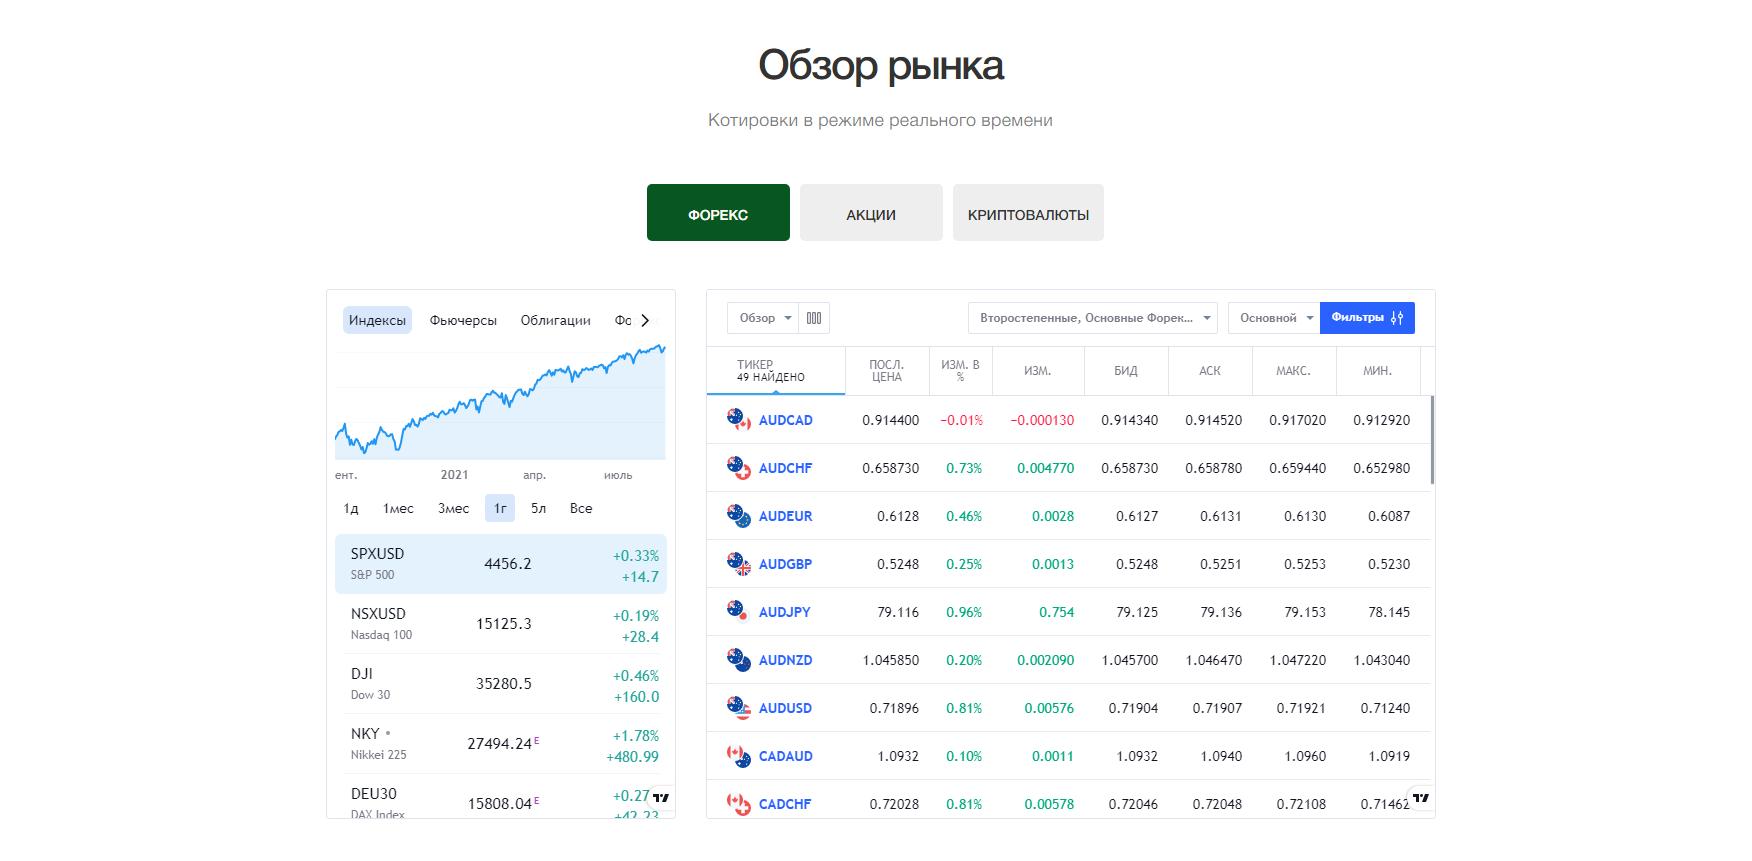 Обзор рынка с Benefit Broker Company